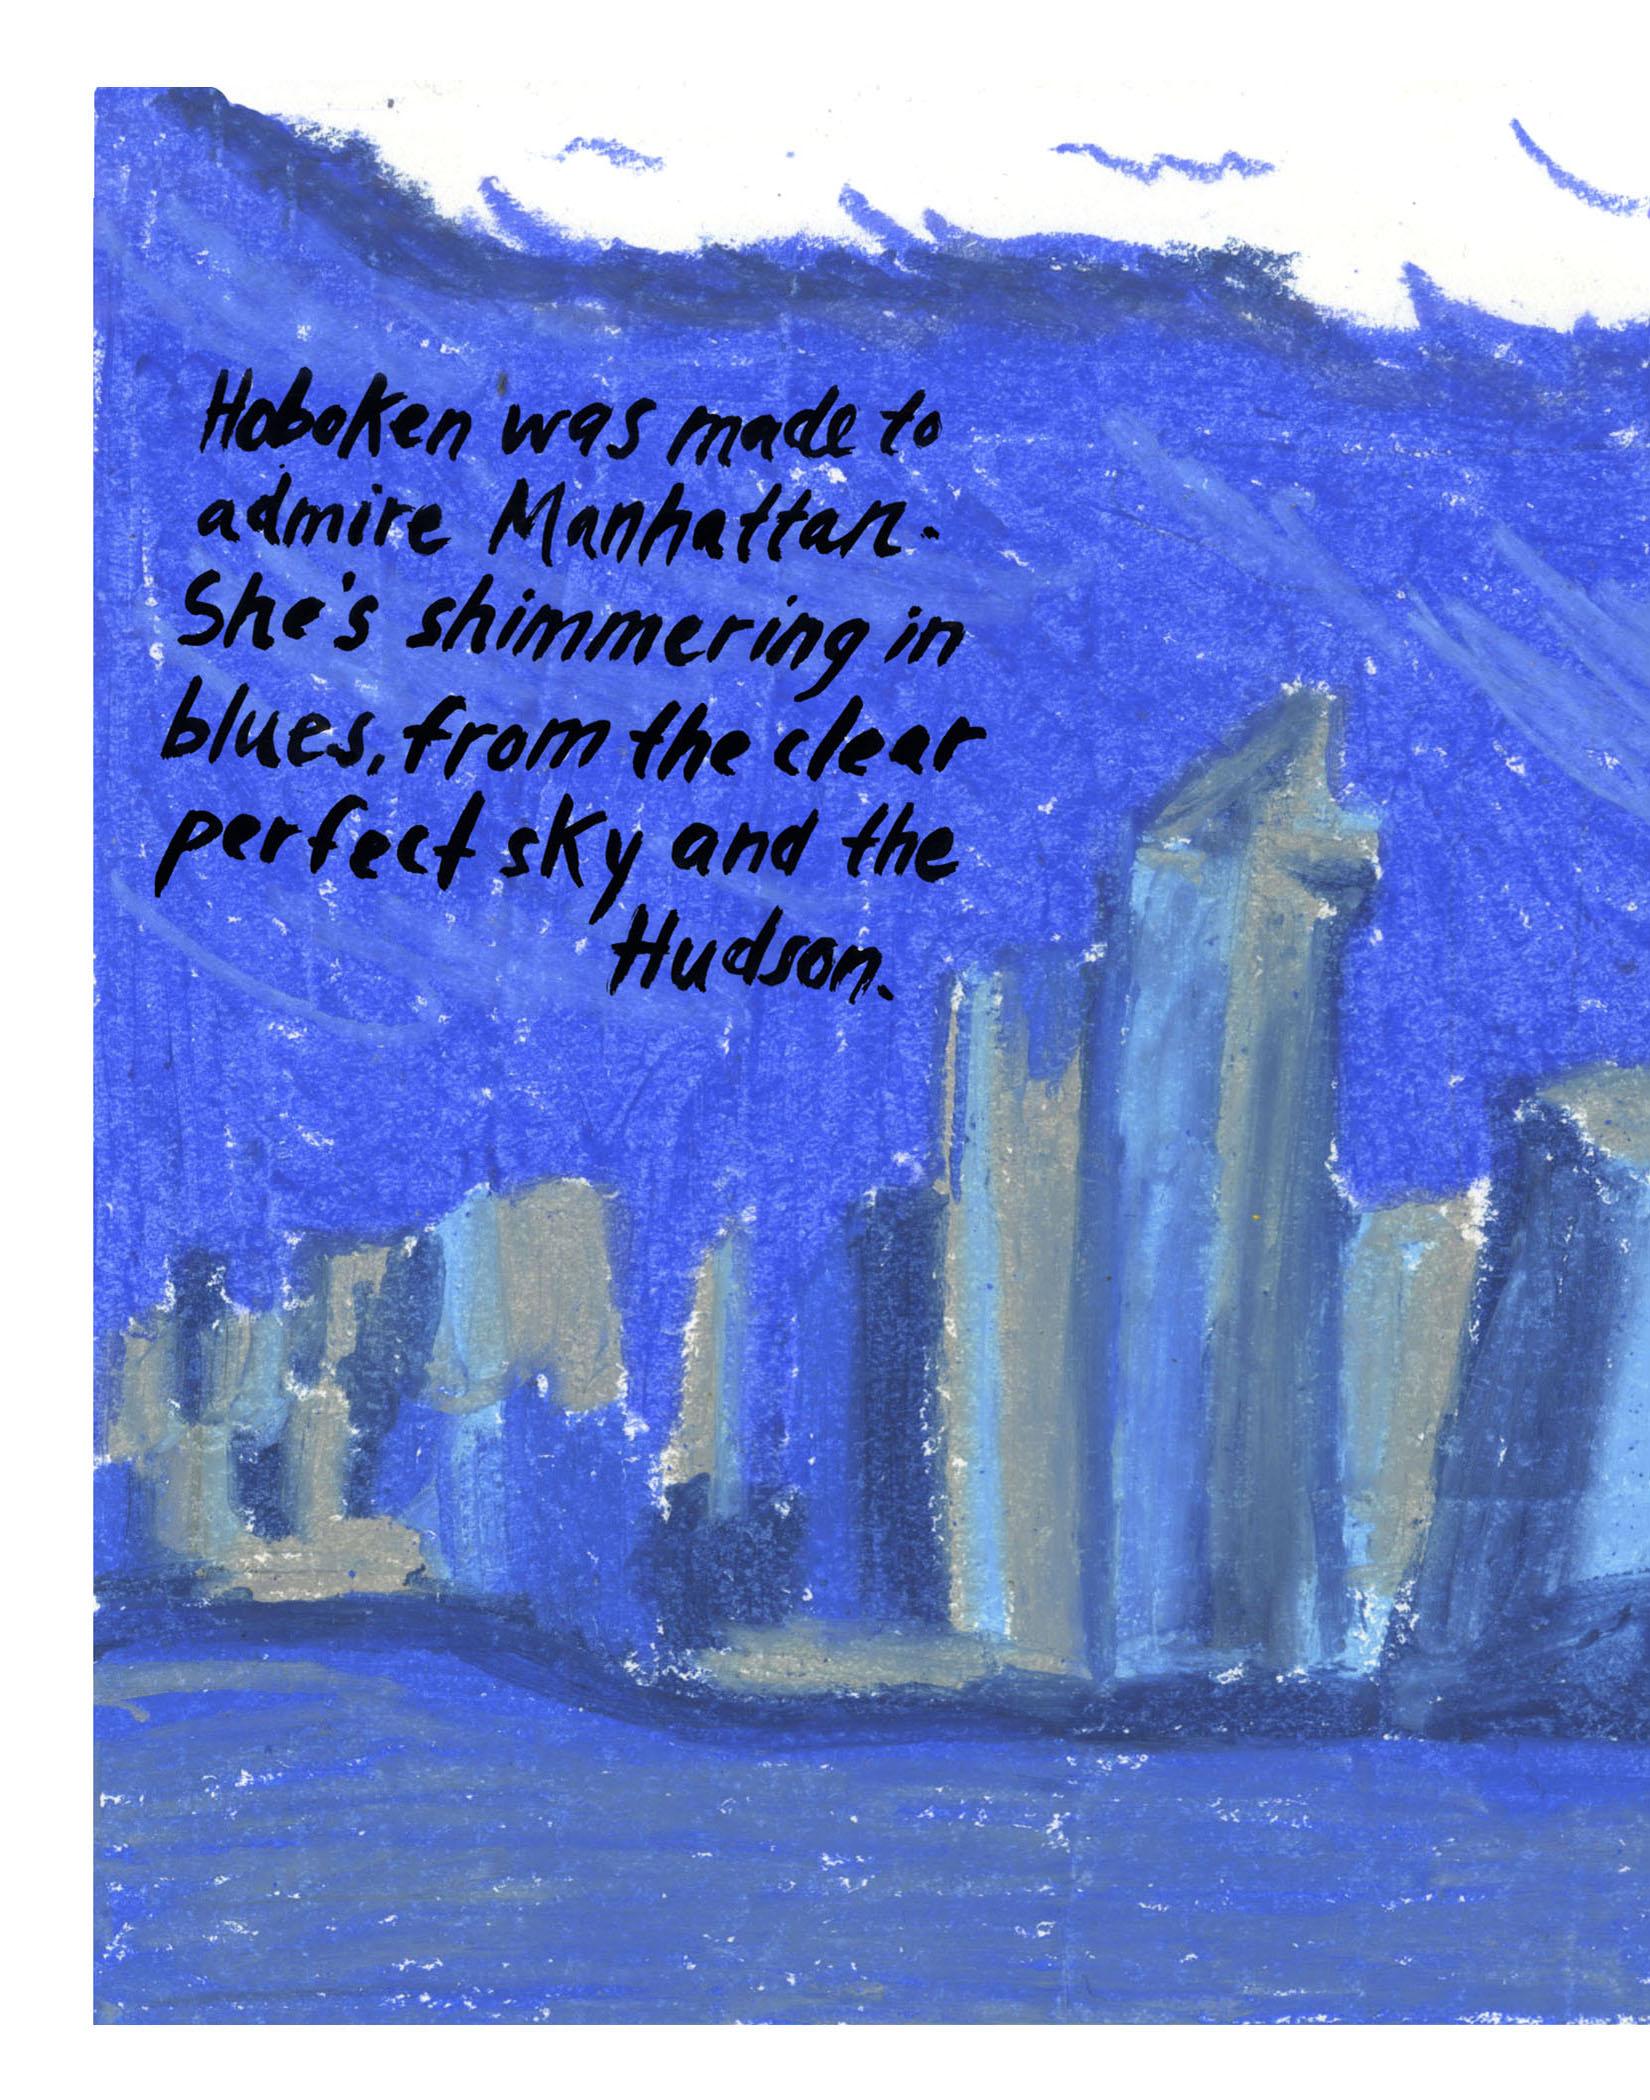 Hoboken - Page 1